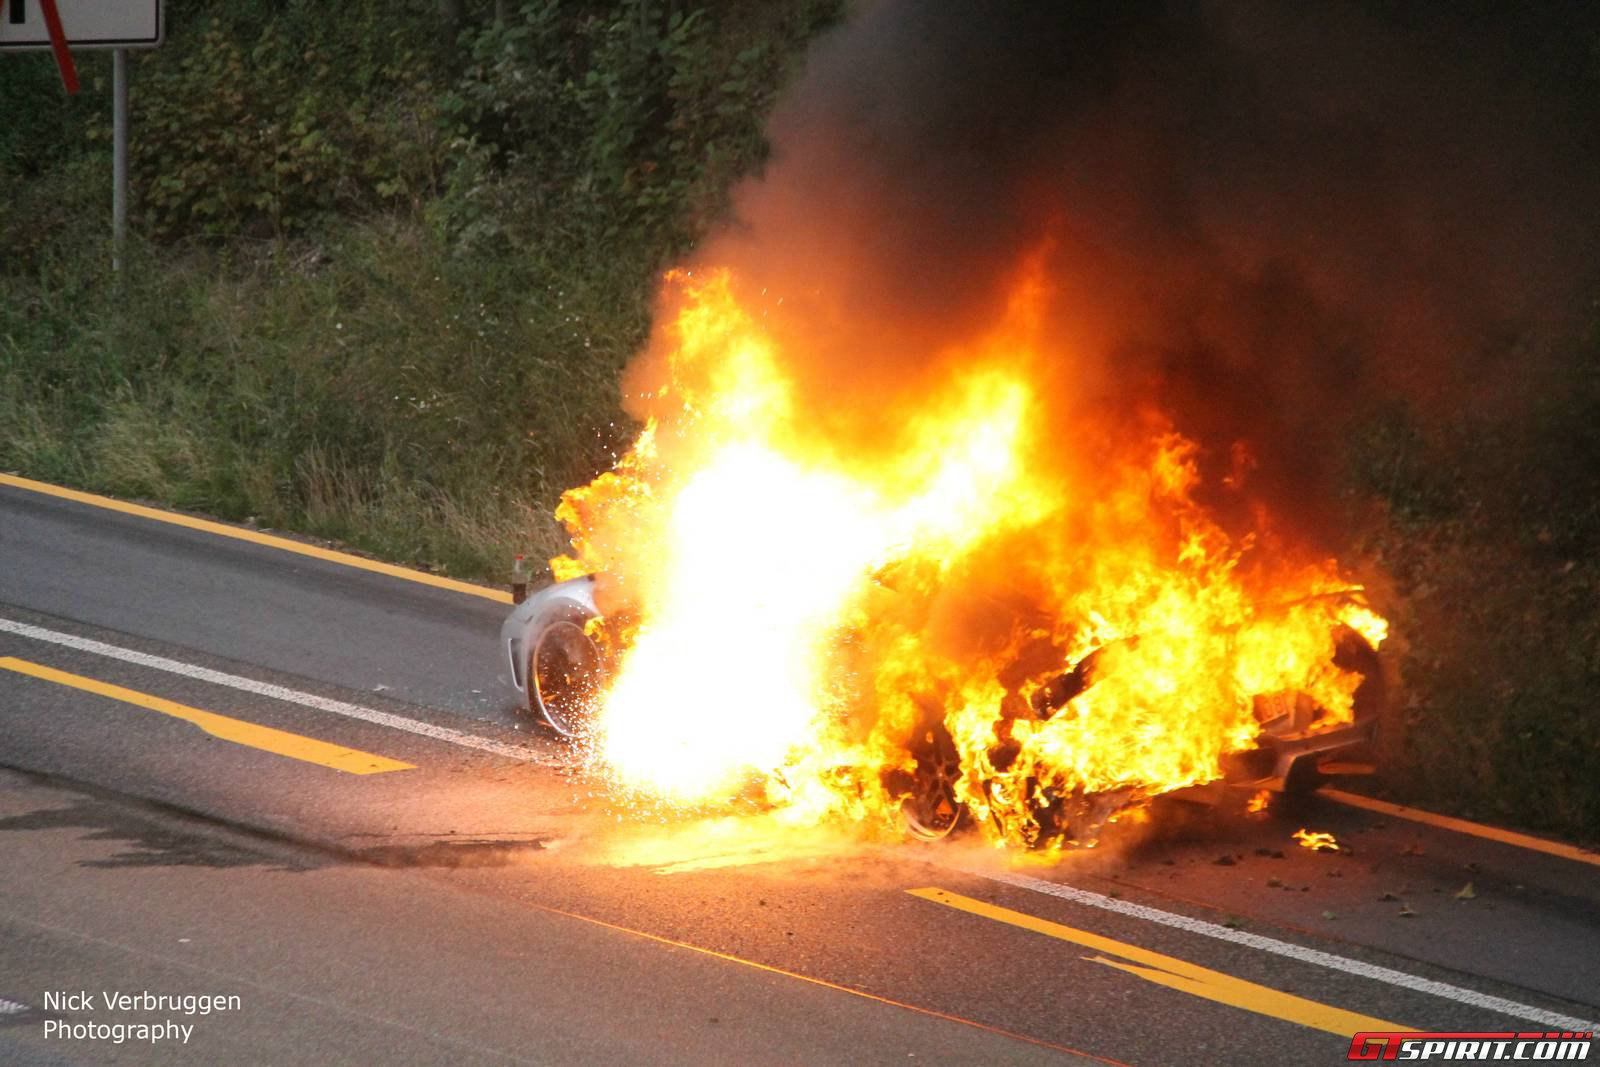 Lamborghini Murcielago Reduced To Ashes In Less Than 15 Minutes Wiring Diagram Car